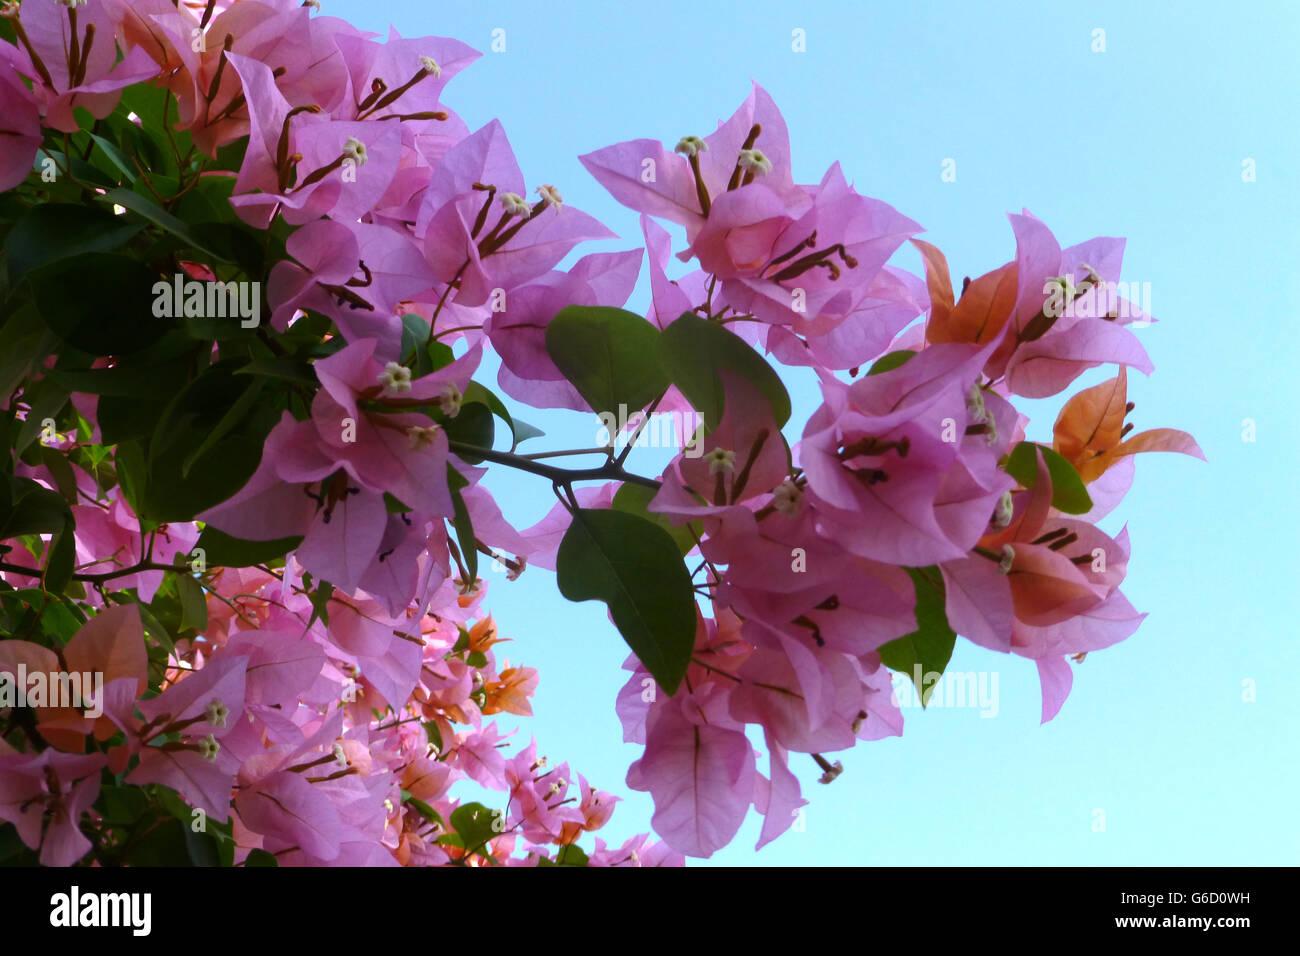 Beautiful tropical flowers found across jamaica stock photos beautiful tropical flowers found across jamaica stock photos beautiful tropical flowers found across jamaica stock images alamy izmirmasajfo